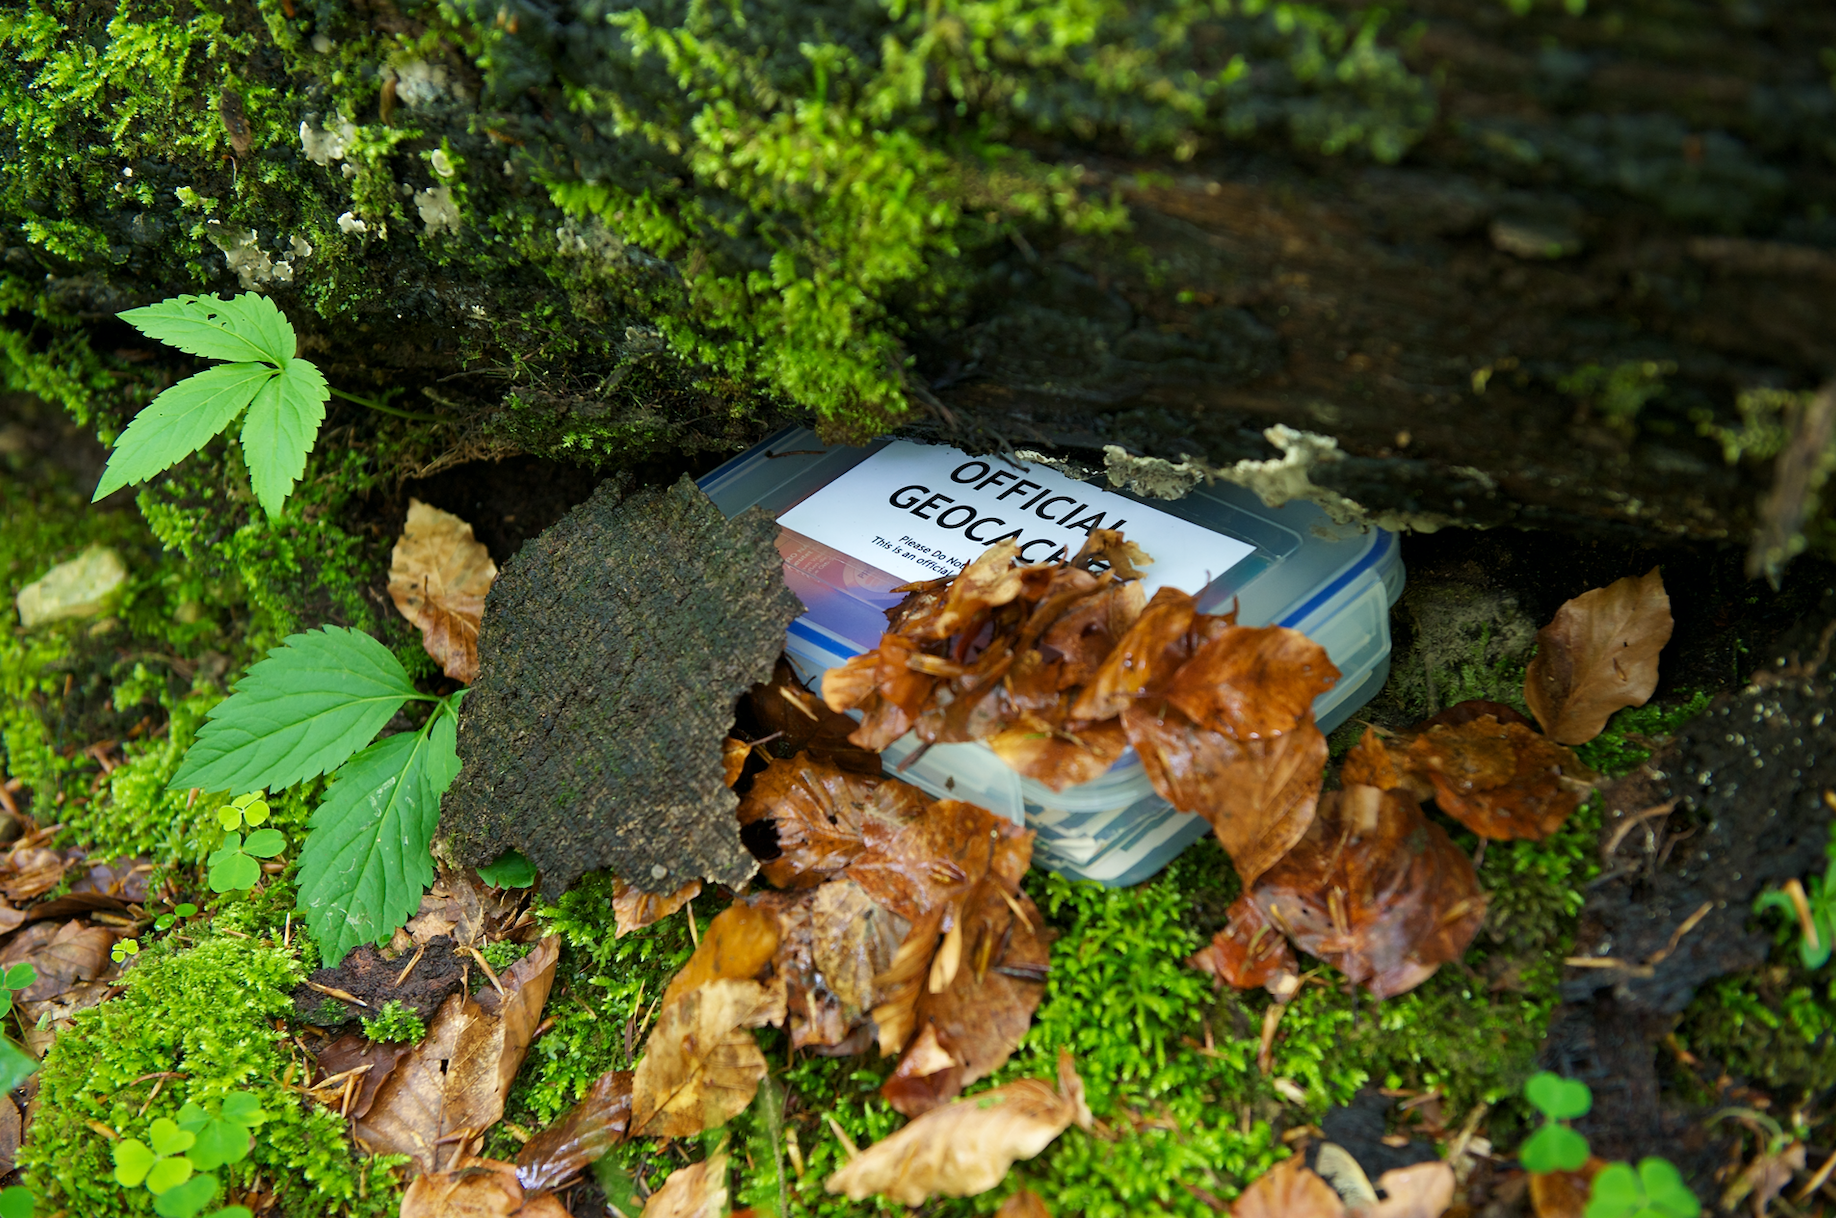 Hidden geocaching box